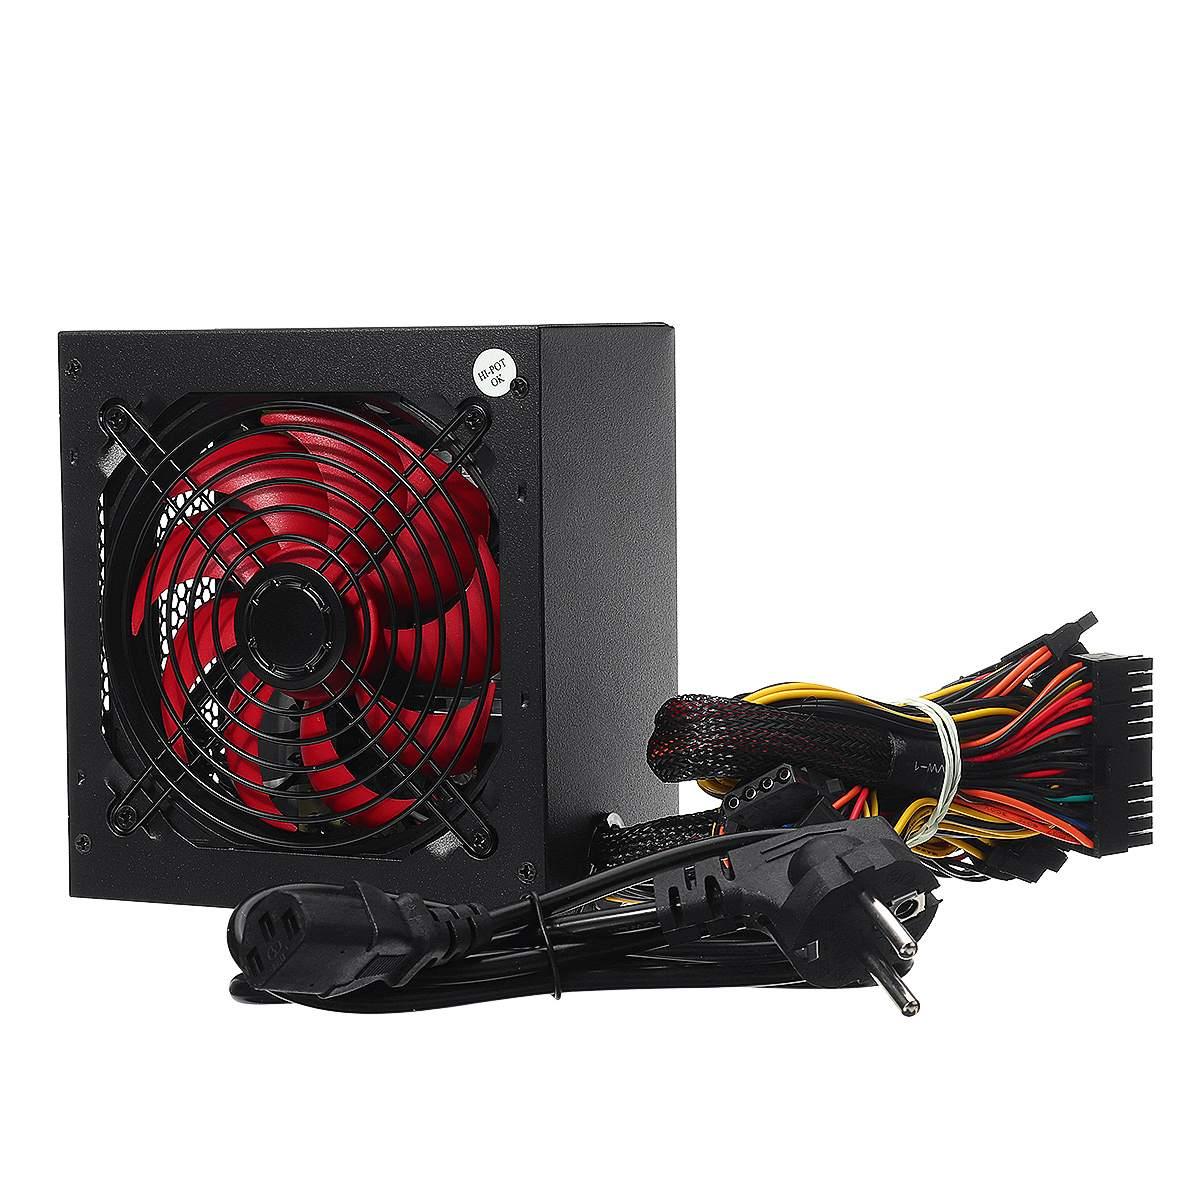 ATX 20/24pin 12V PC ordenador SATA Gaming PC fuente de alimentación pasiva PFC ventilador silencioso 650W fuente de alimentación